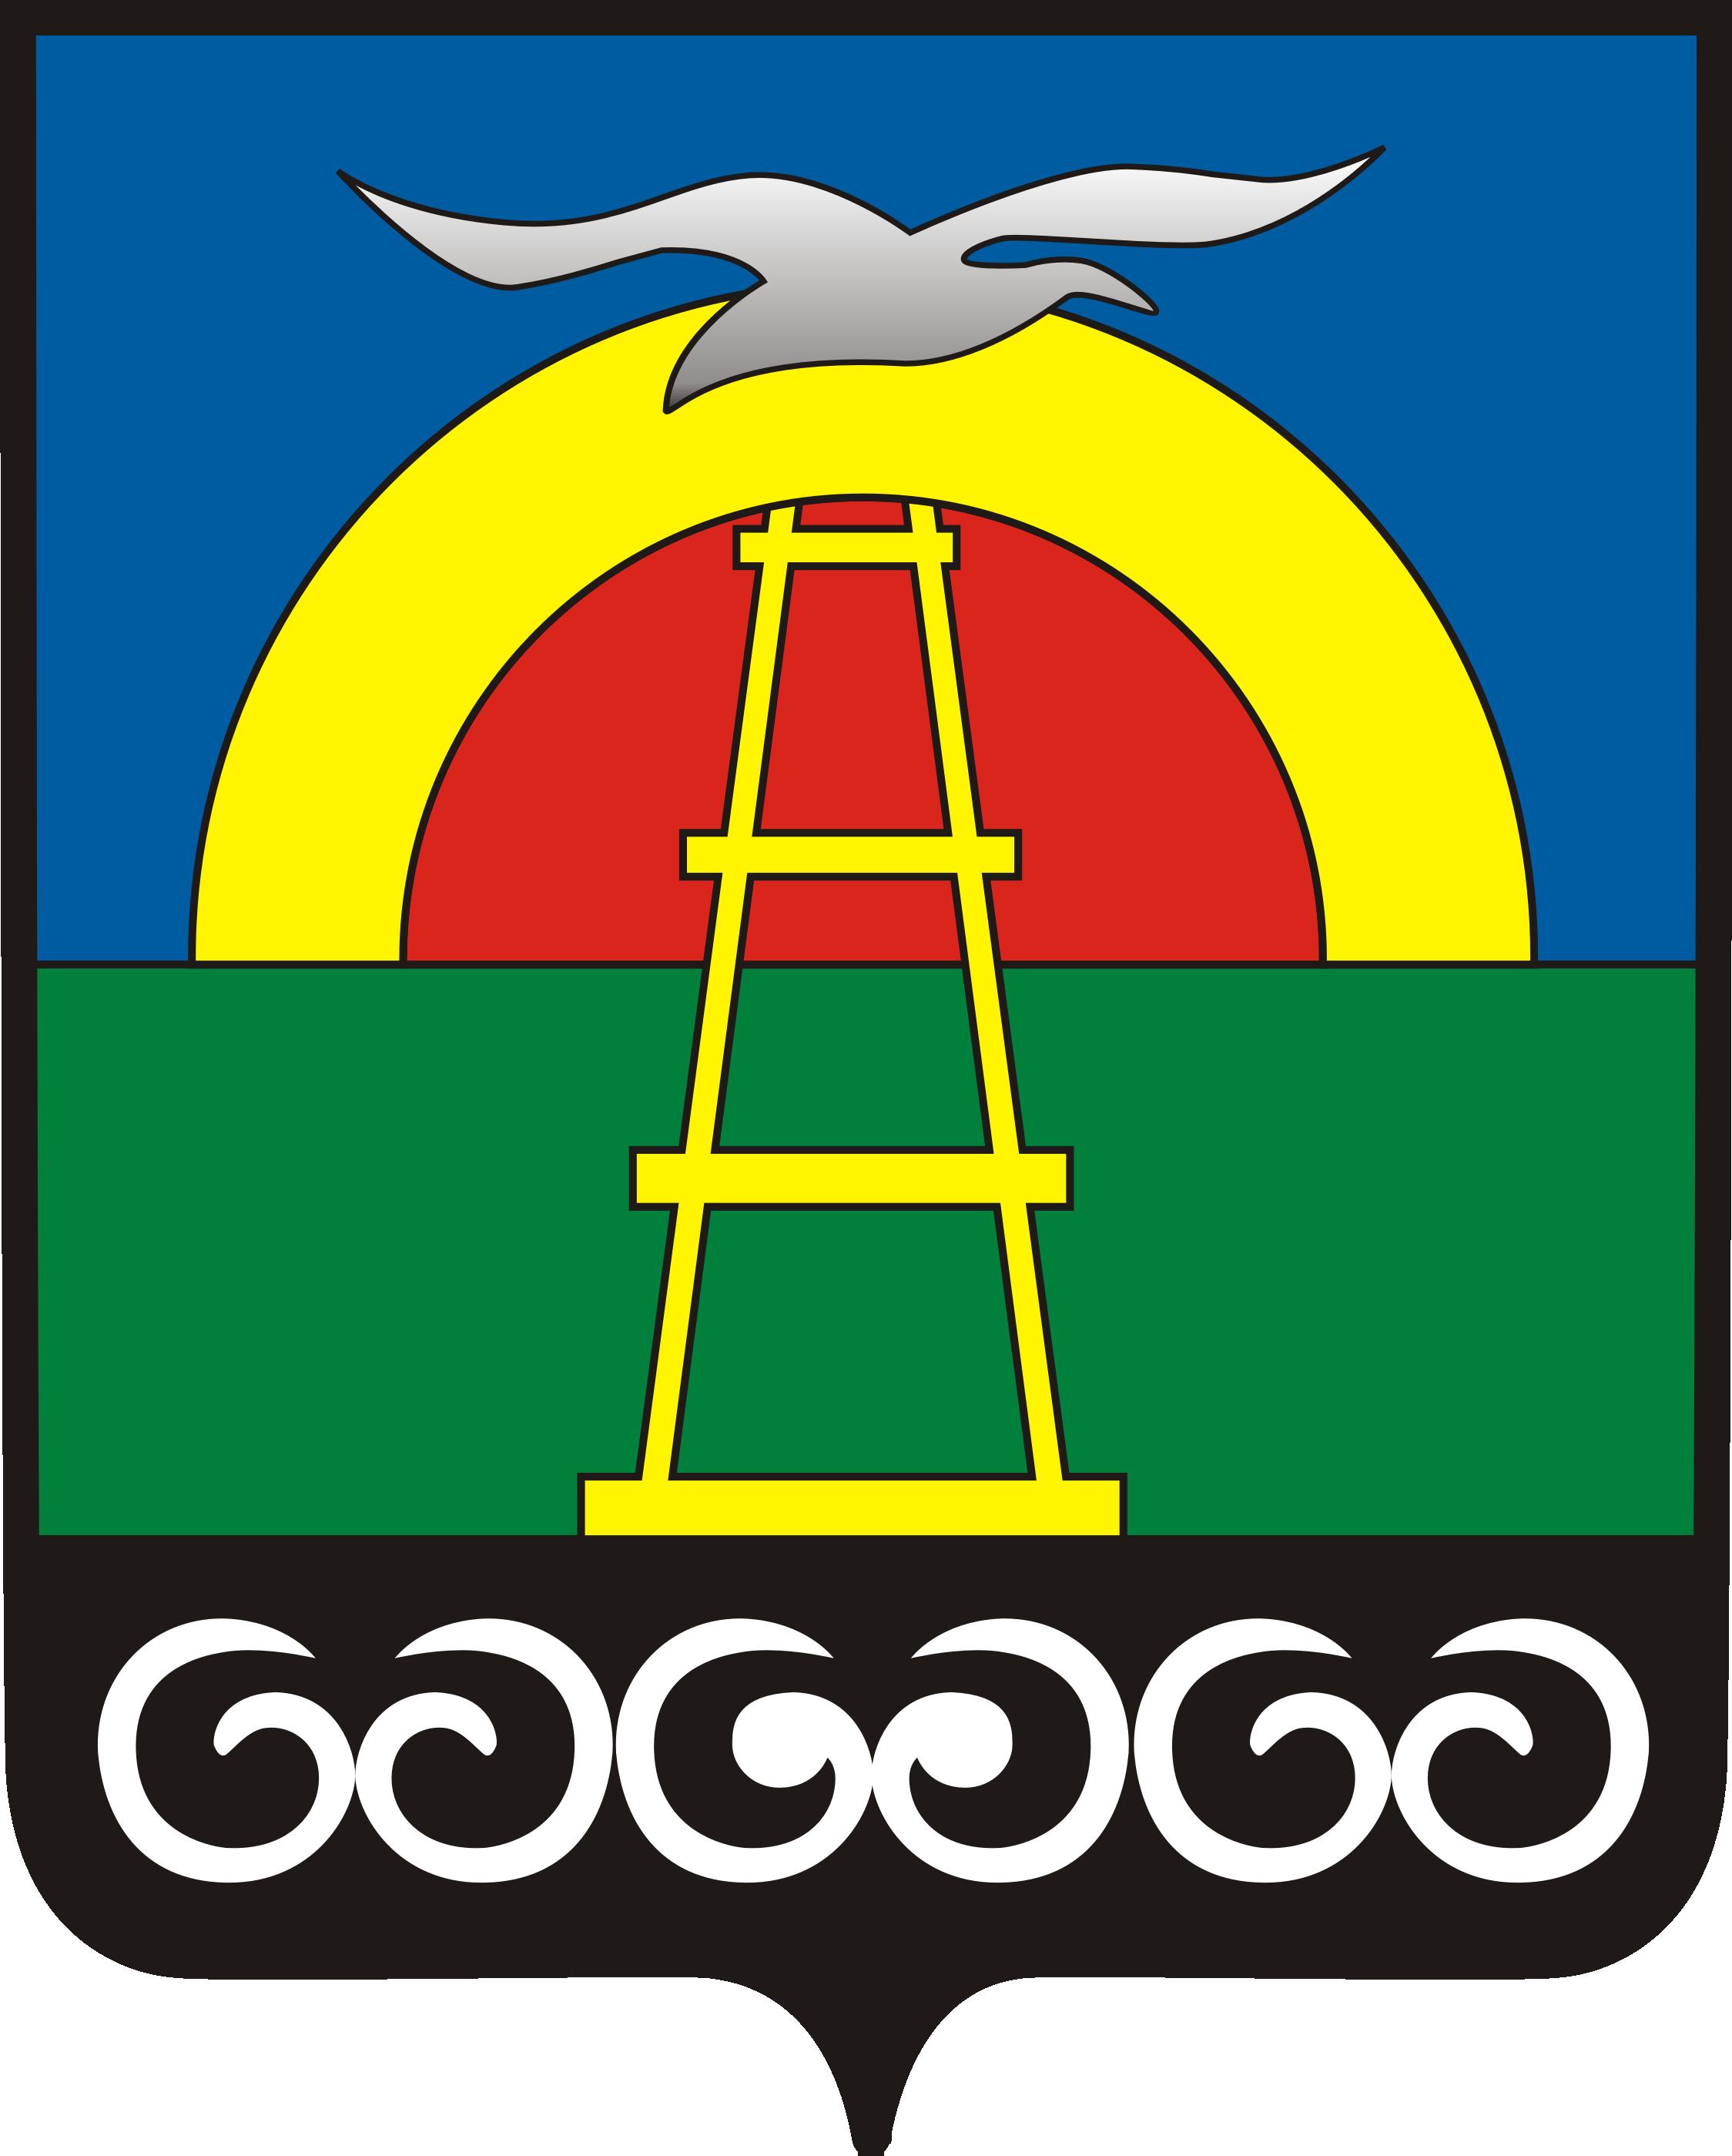 Охинский район - герб